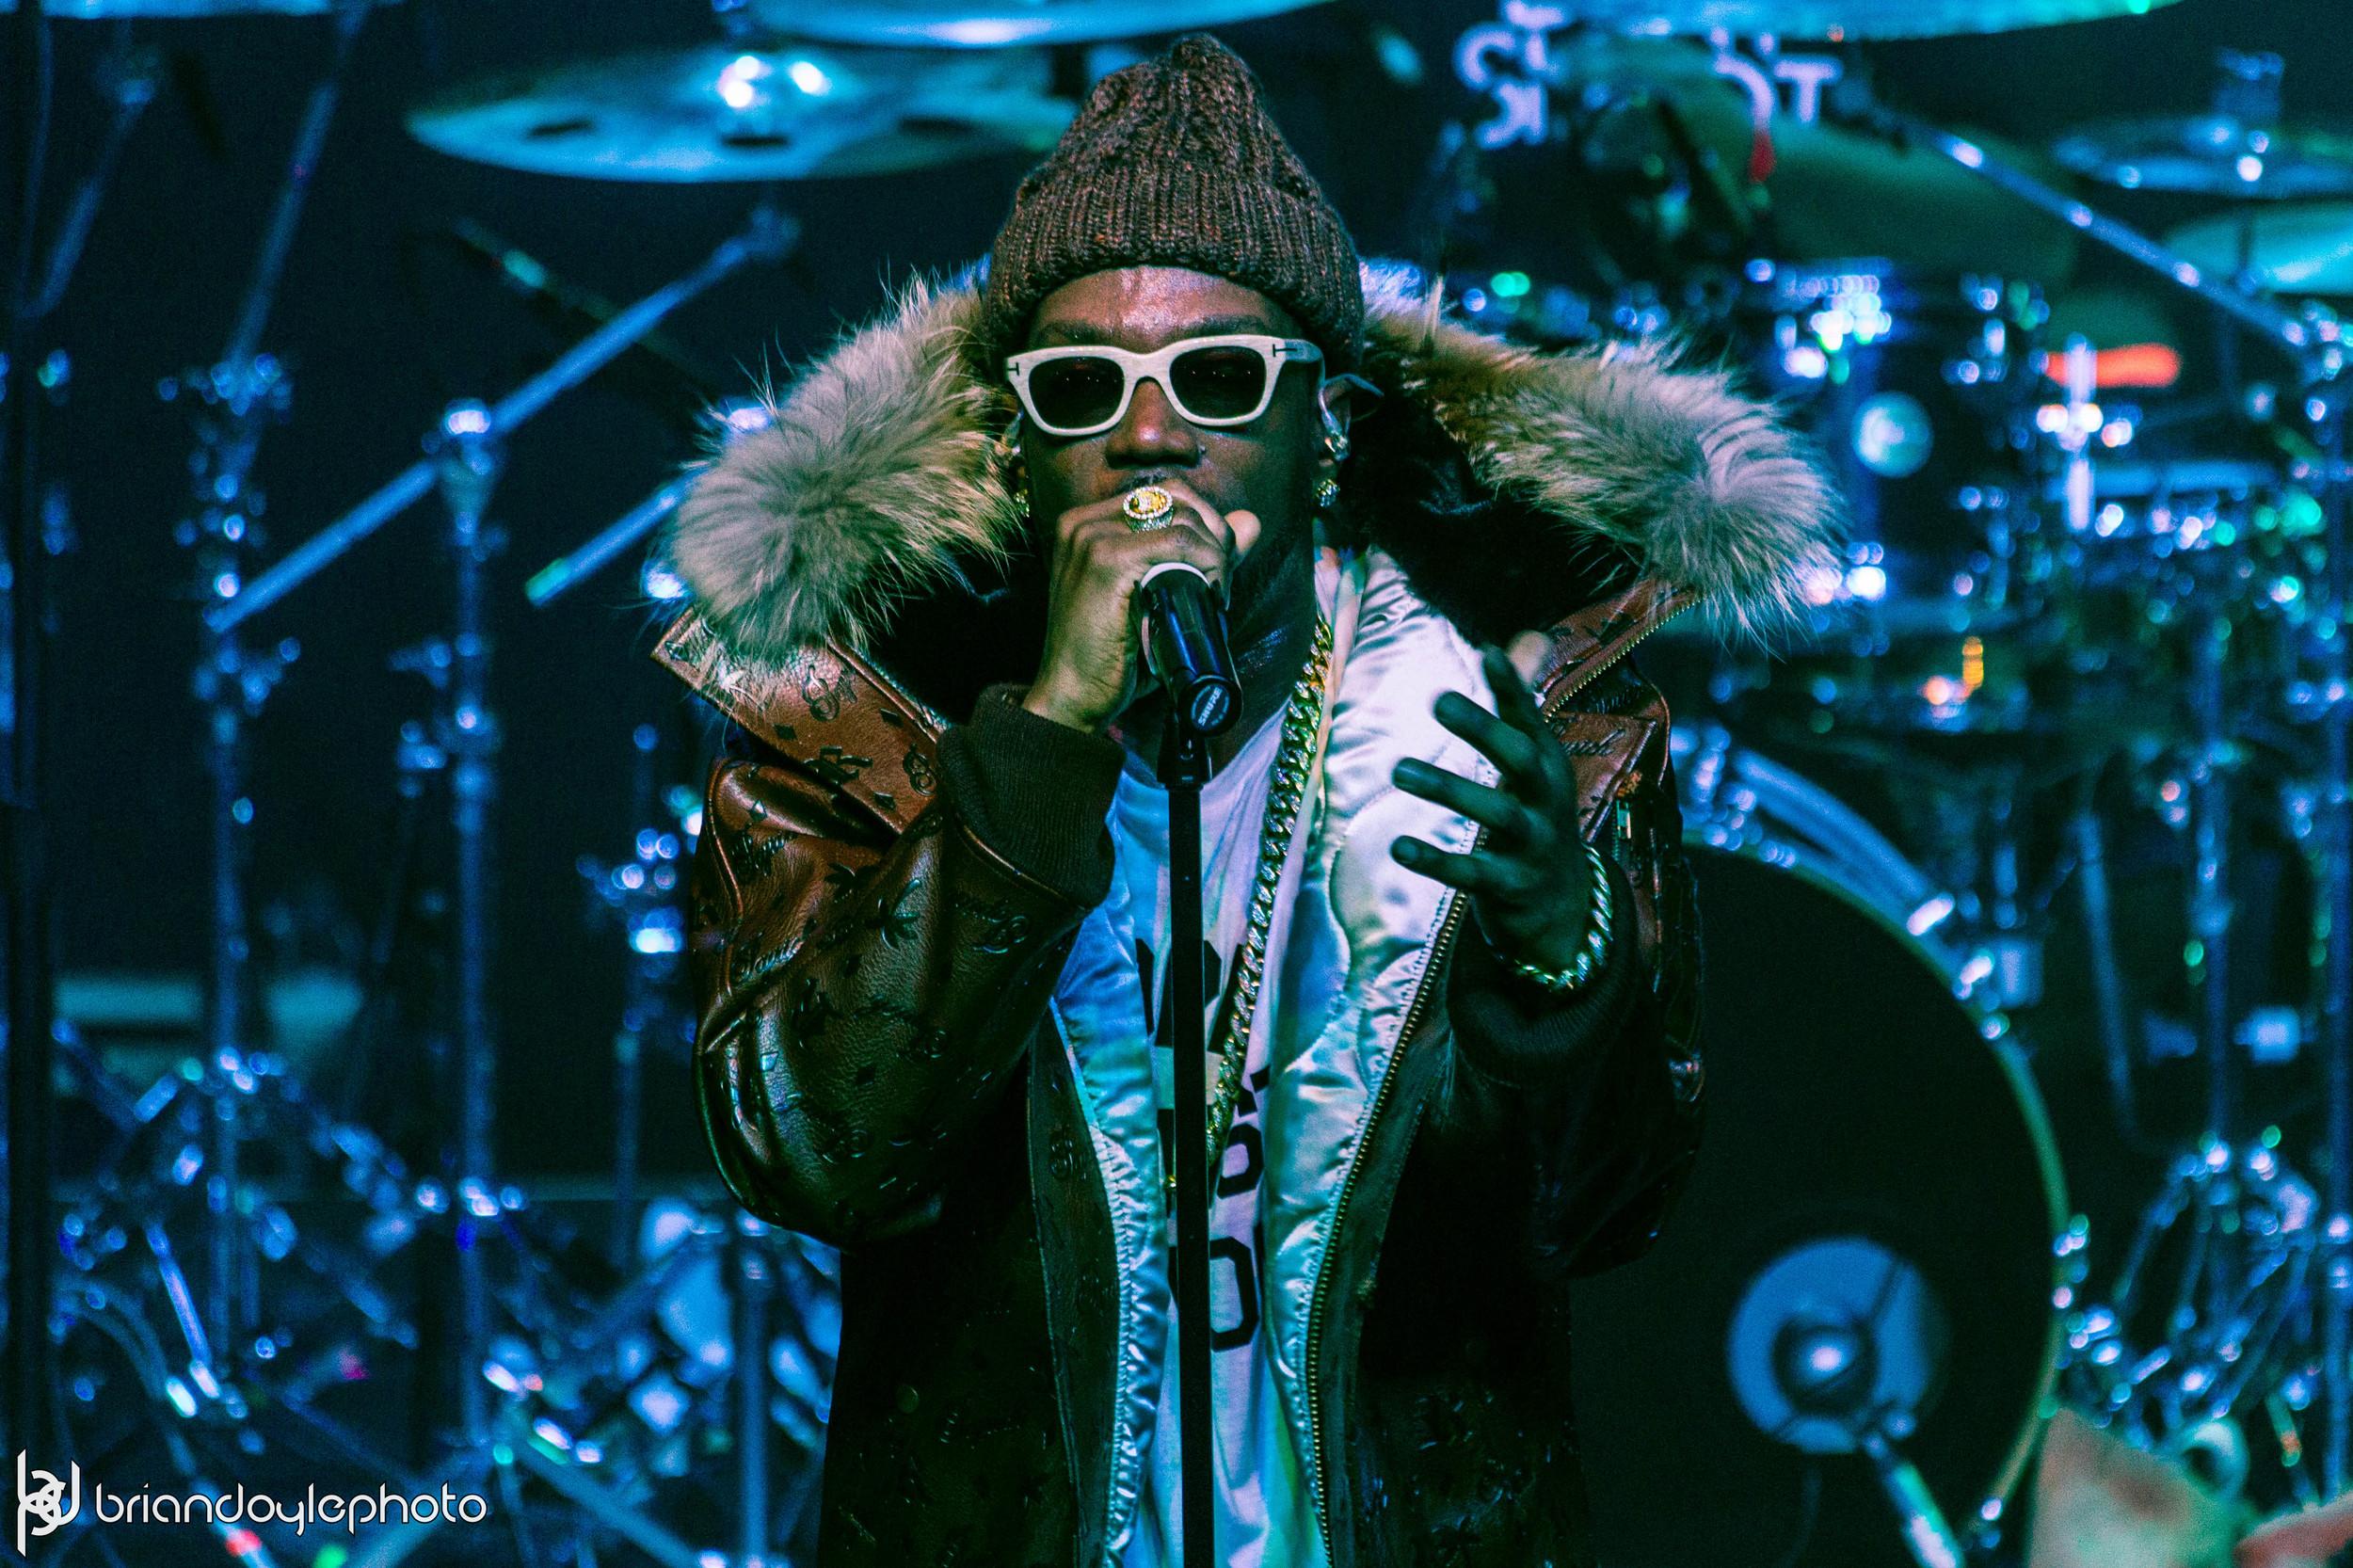 Lil Wayne, Juicy J, Two-9, Tree @ The Fonda 25.11.2014-34.jpg